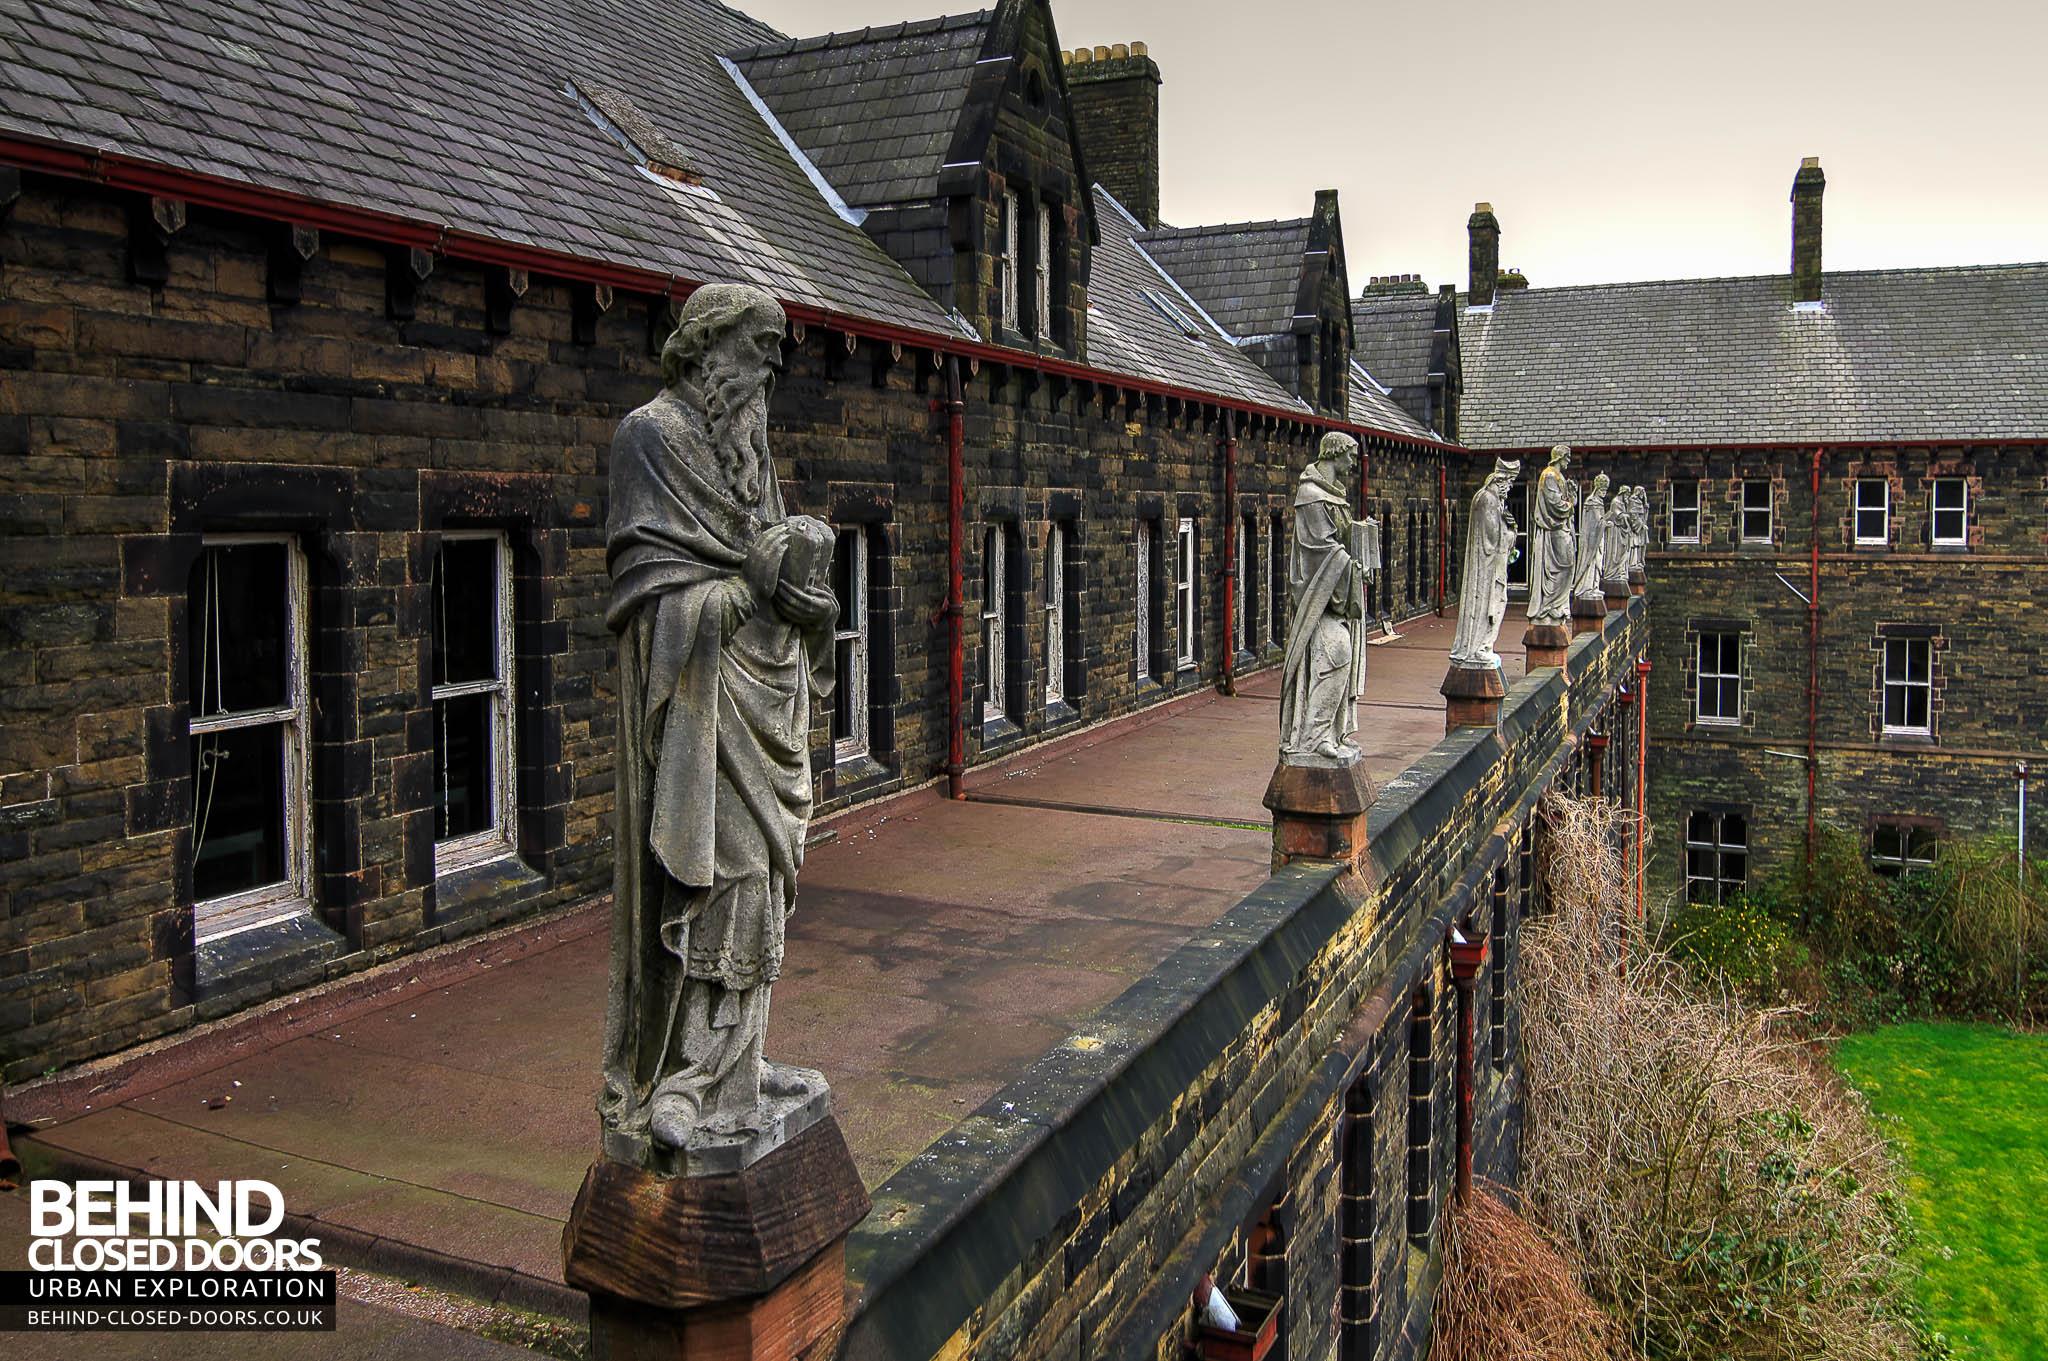 St Joseph S Seminary Upholland Lancashire 187 Urbex